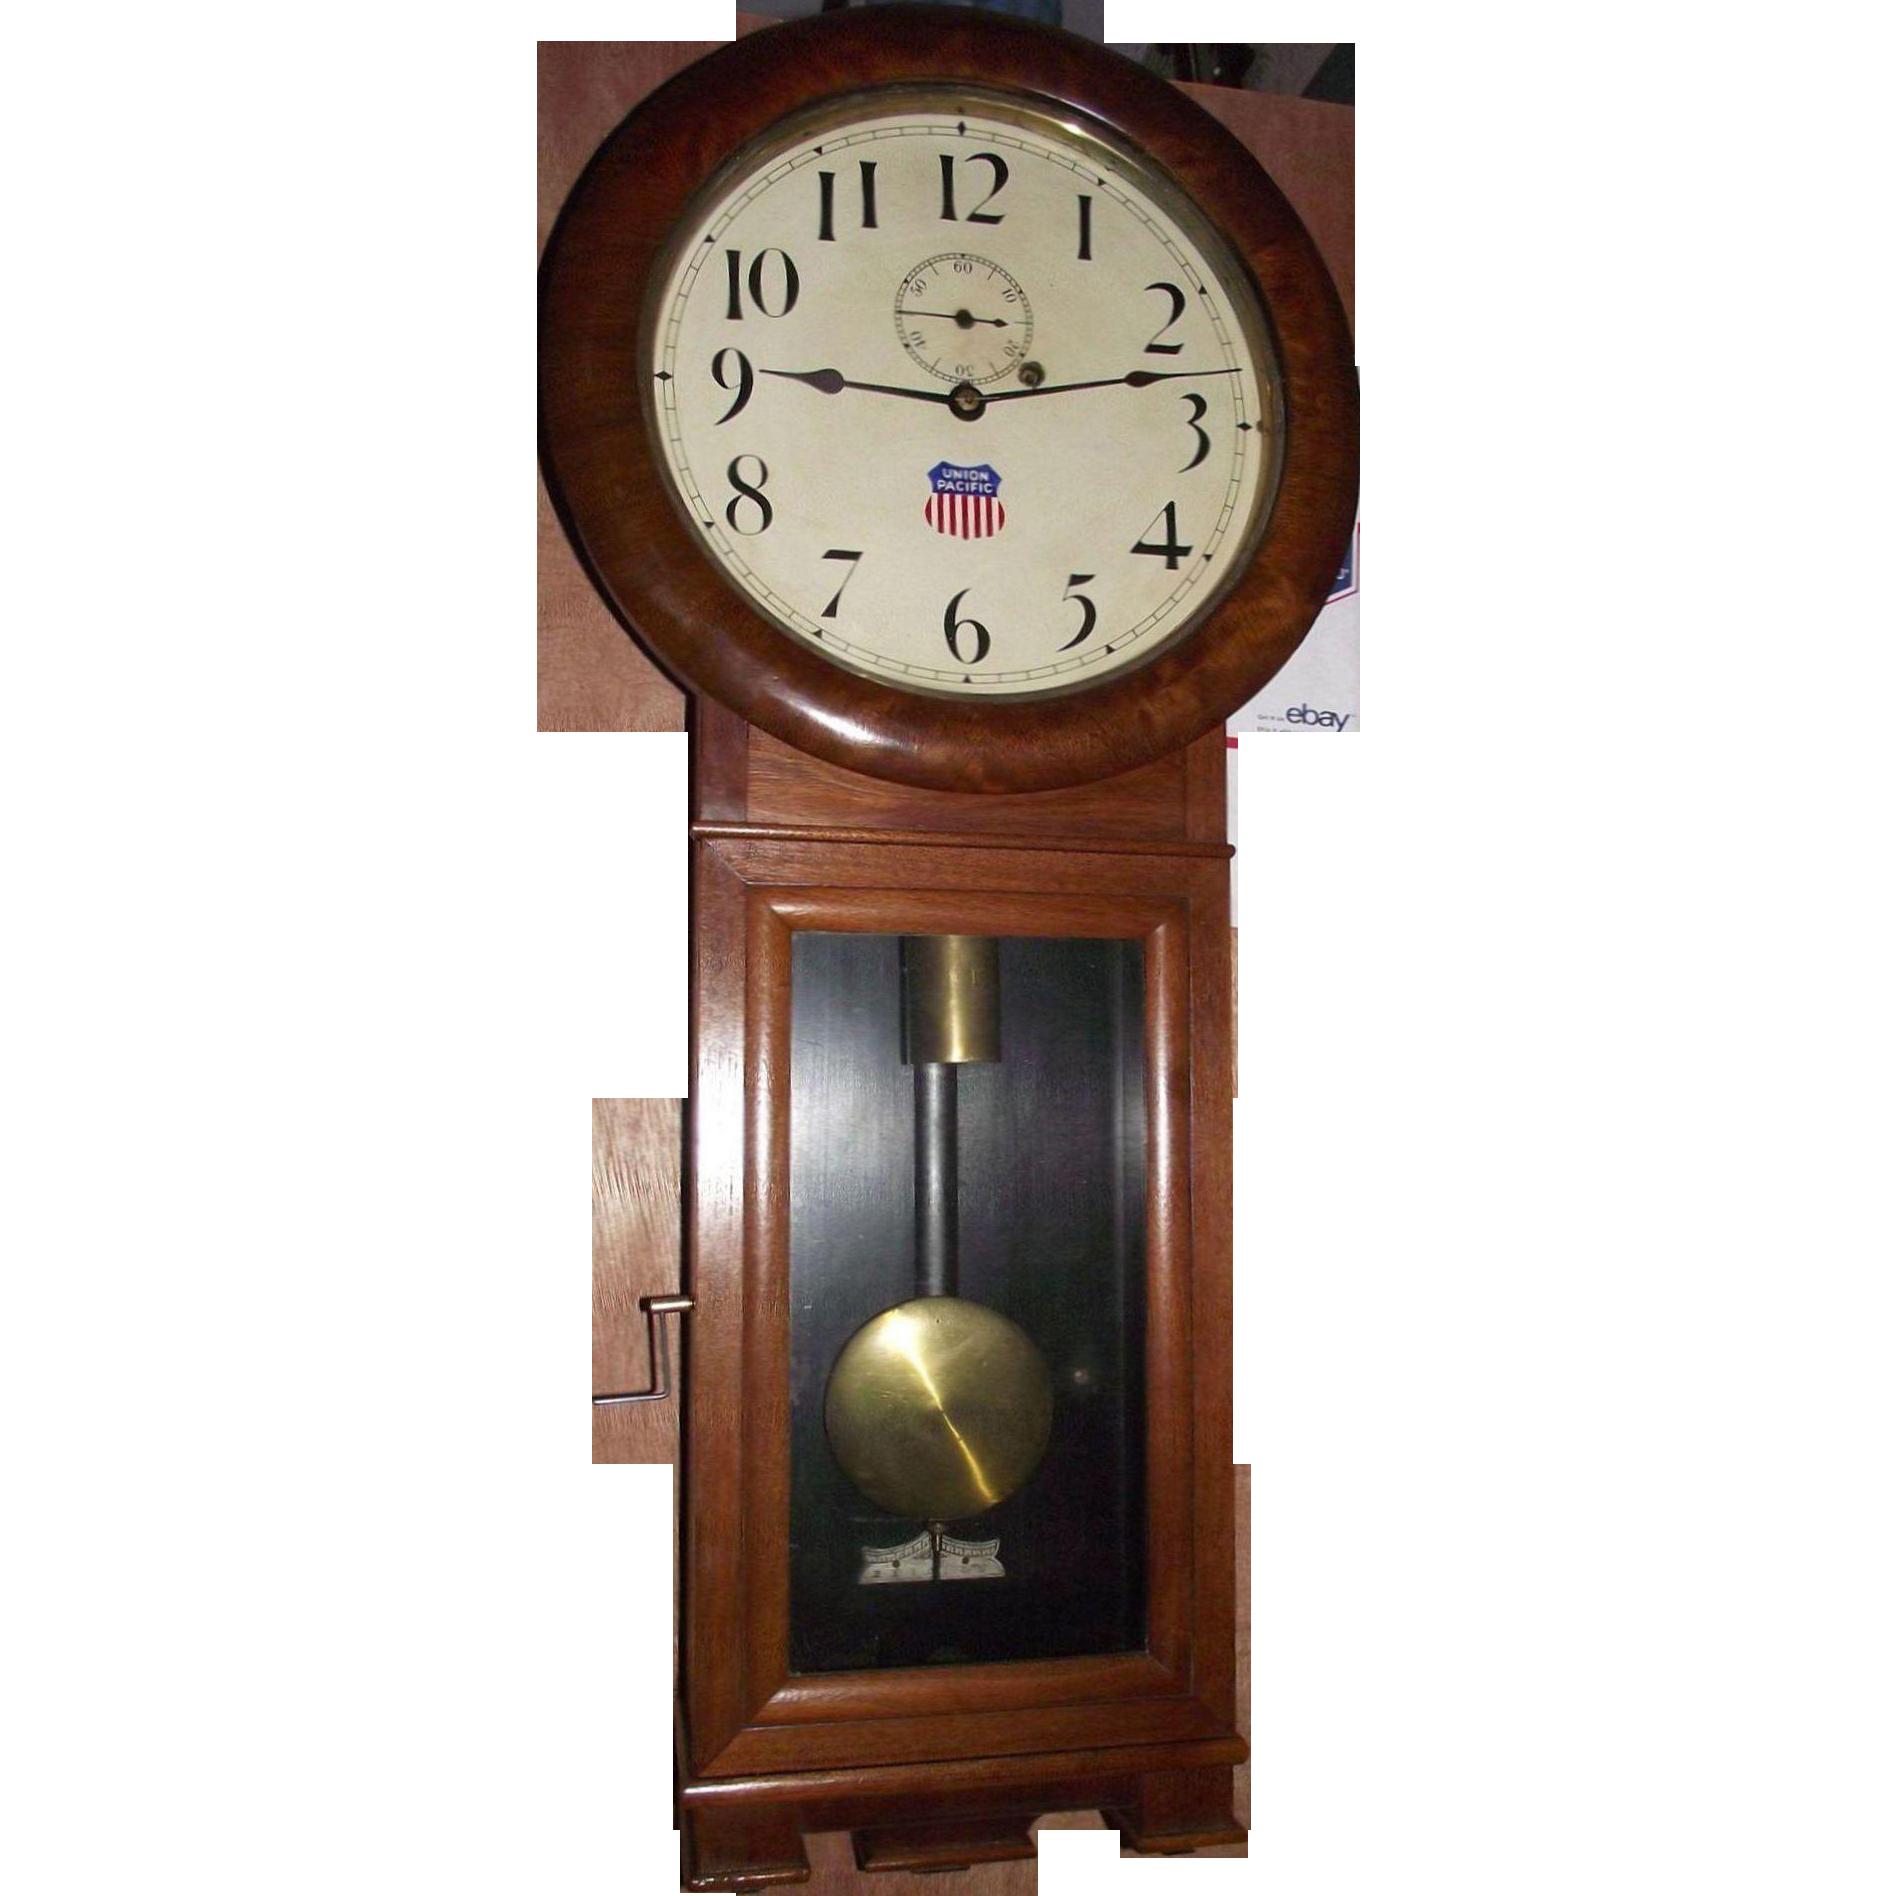 Early union pacific railway seth thomas 2 regulator clock with early union pacific railway seth thomas 2 regulator clock with 3 piece bottom in a pristine walnut case circa 1913 amipublicfo Gallery